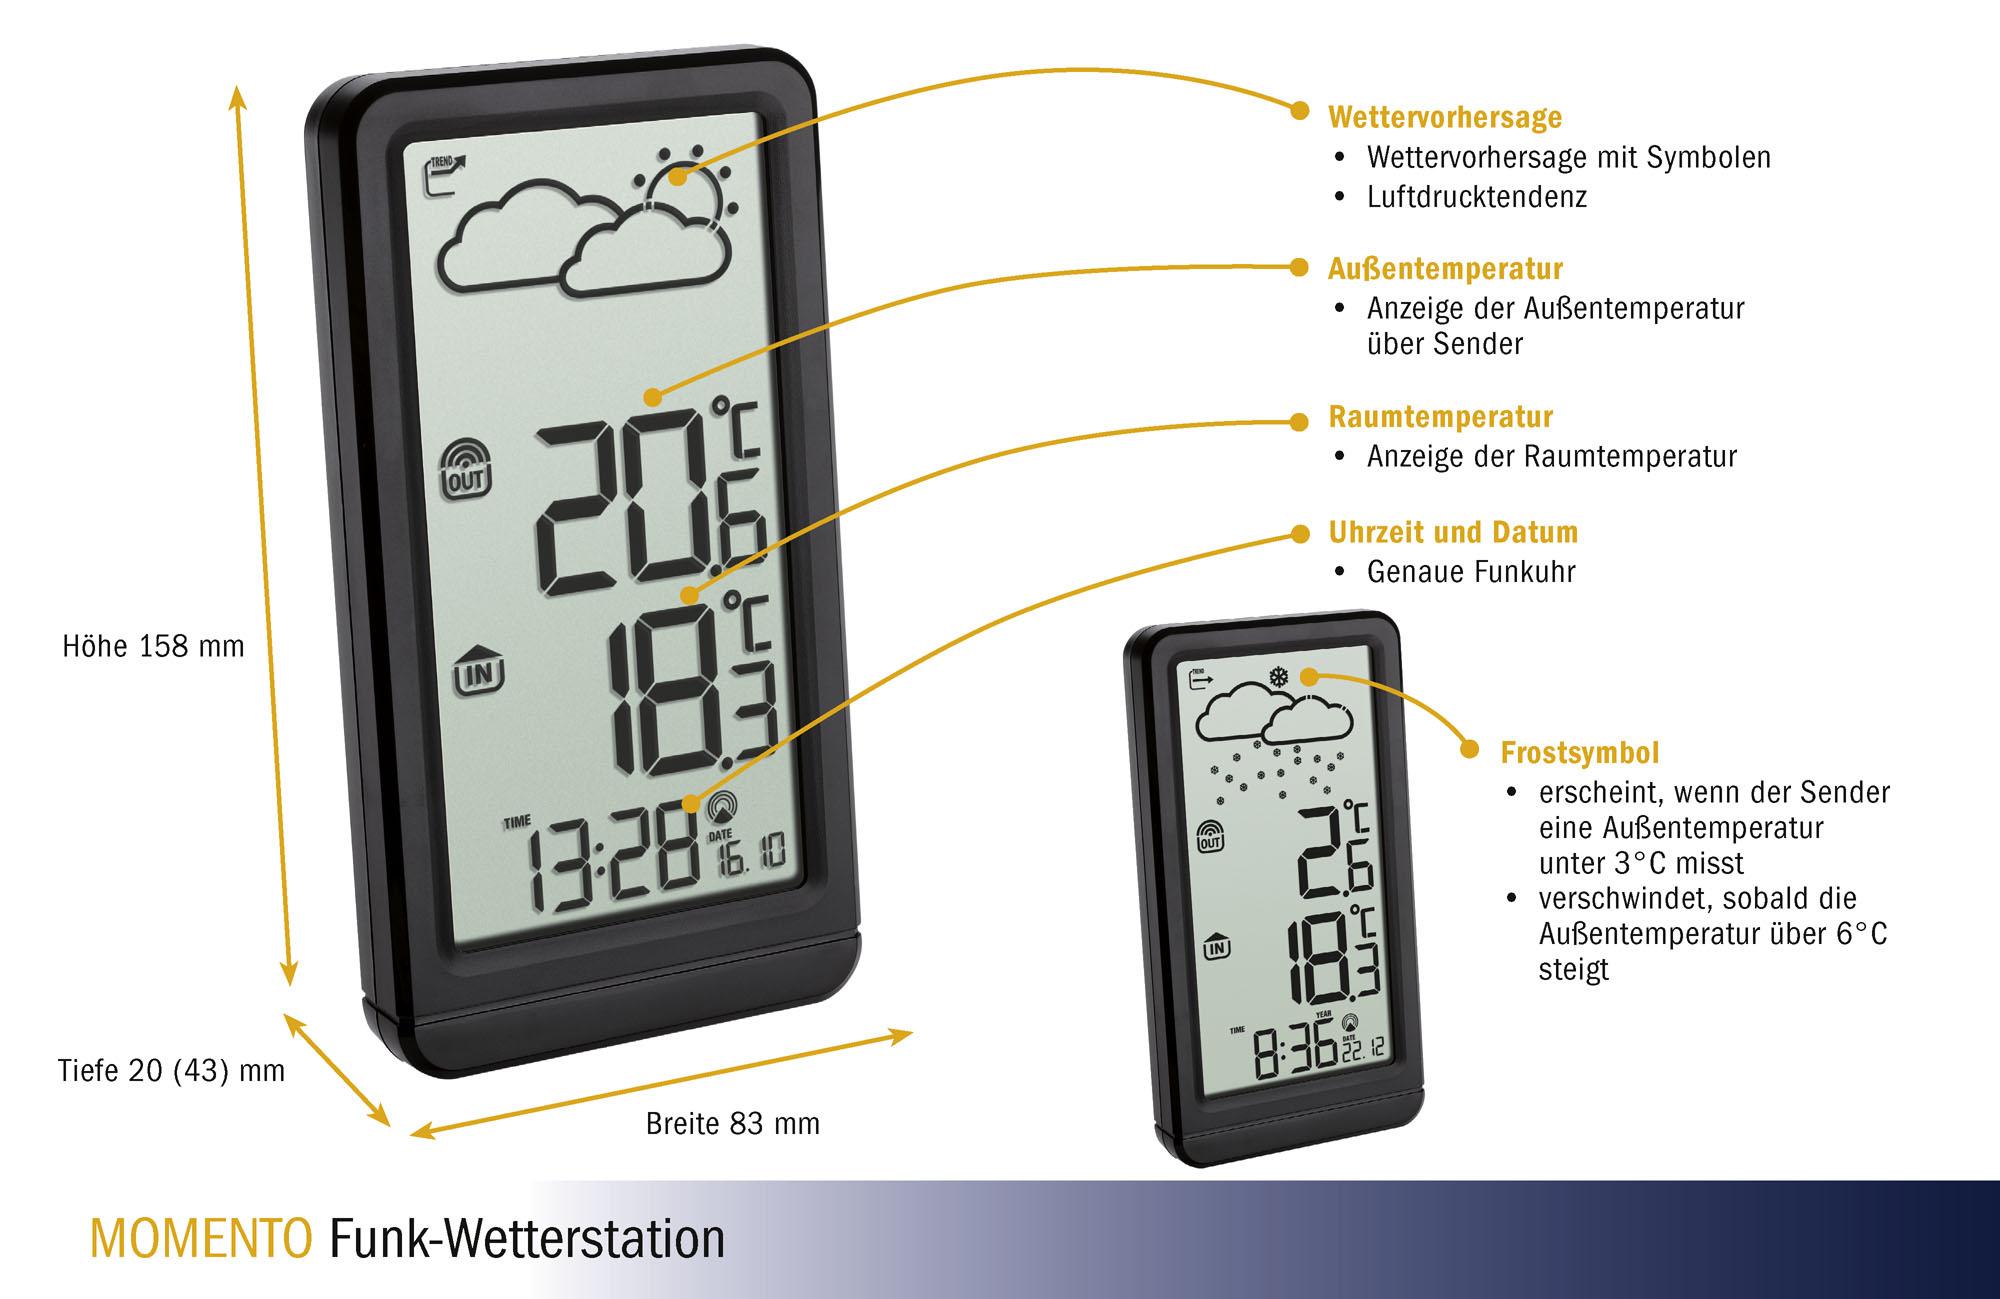 Funk-Wetterstation_351149_Bemassung.jpg